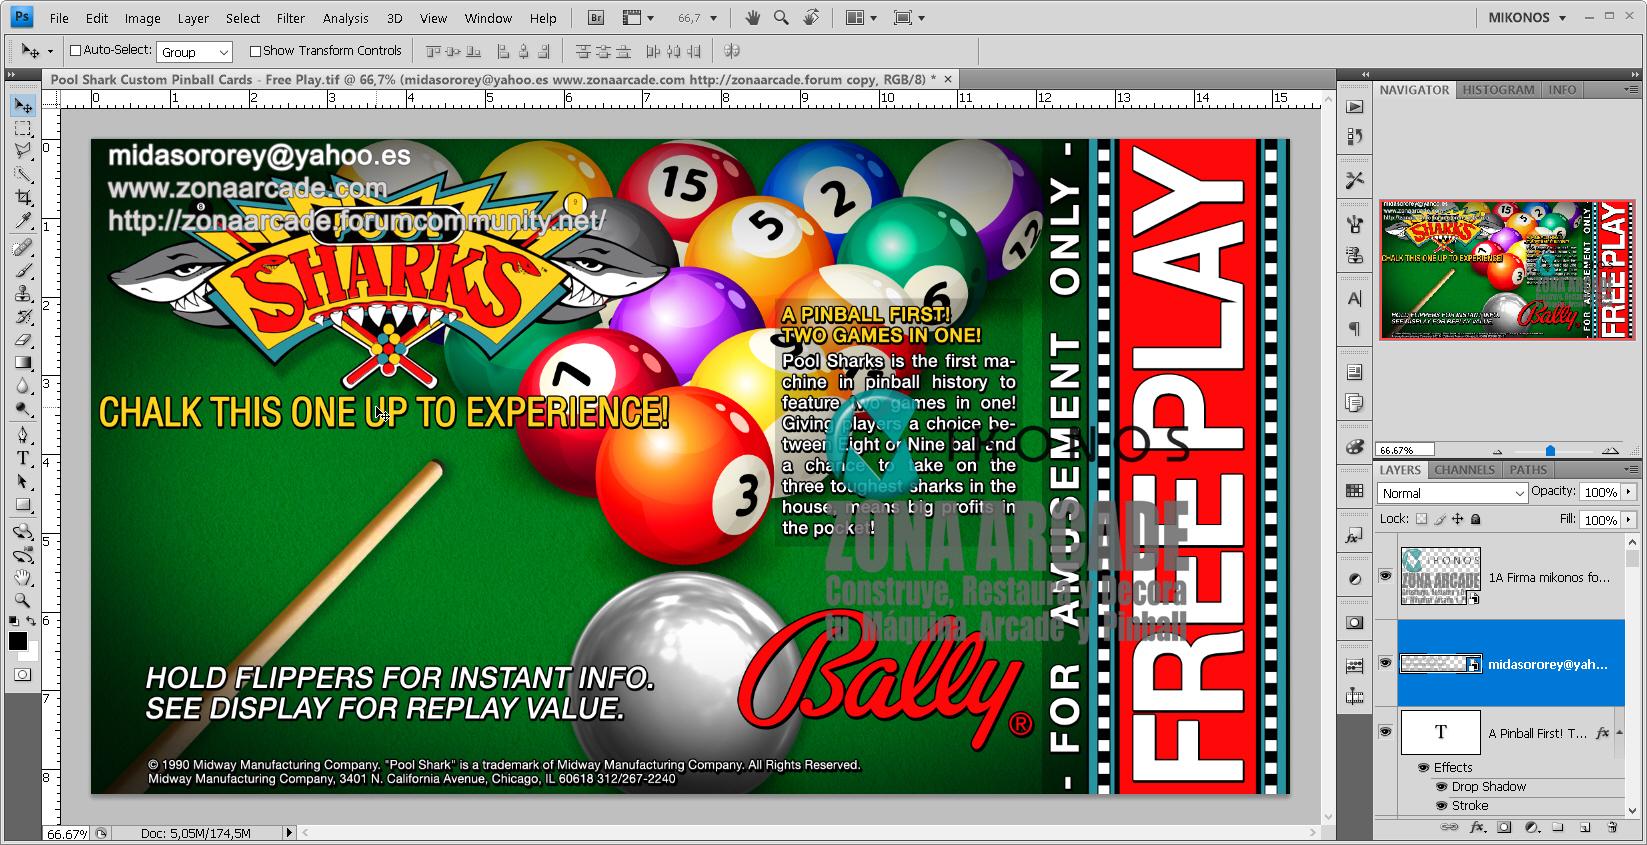 Pool%20Shark%20Pinball%20Card%20Customized%20-%20Free%20Play.%20Mikonos1.jpg